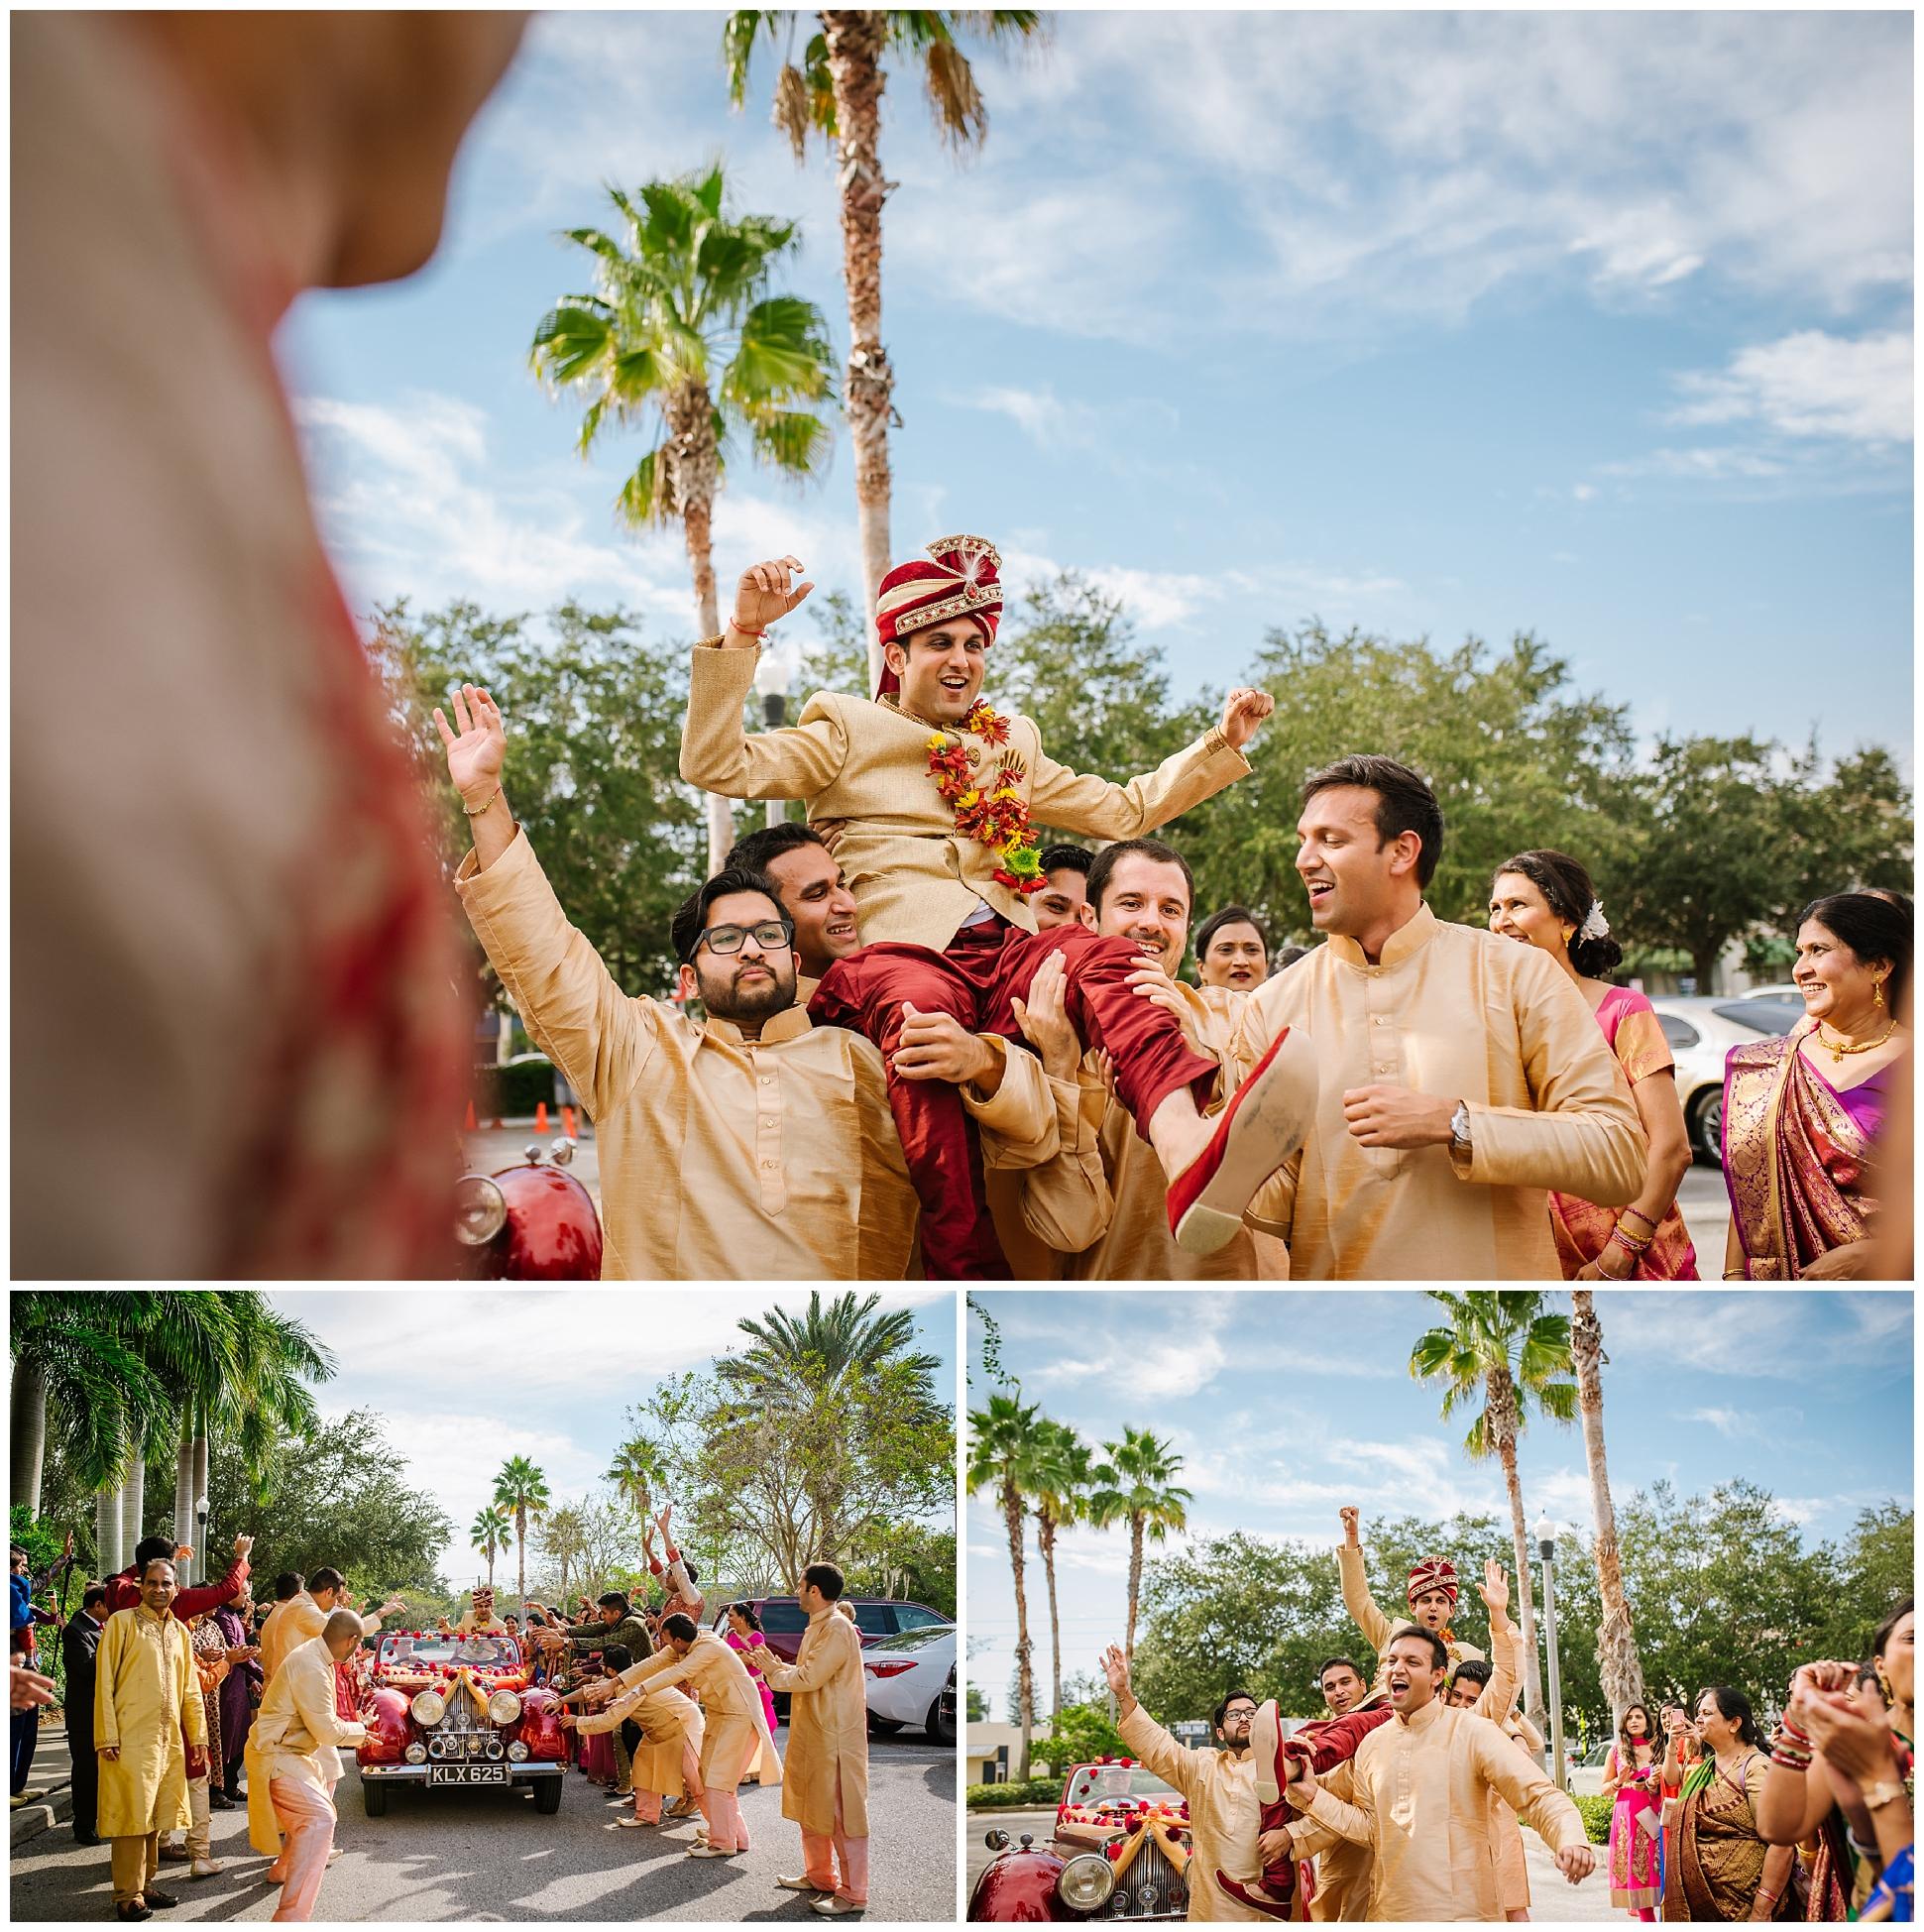 St-pete-indian-wedding-photographer-barat-sunken-gardens_0089.jpg